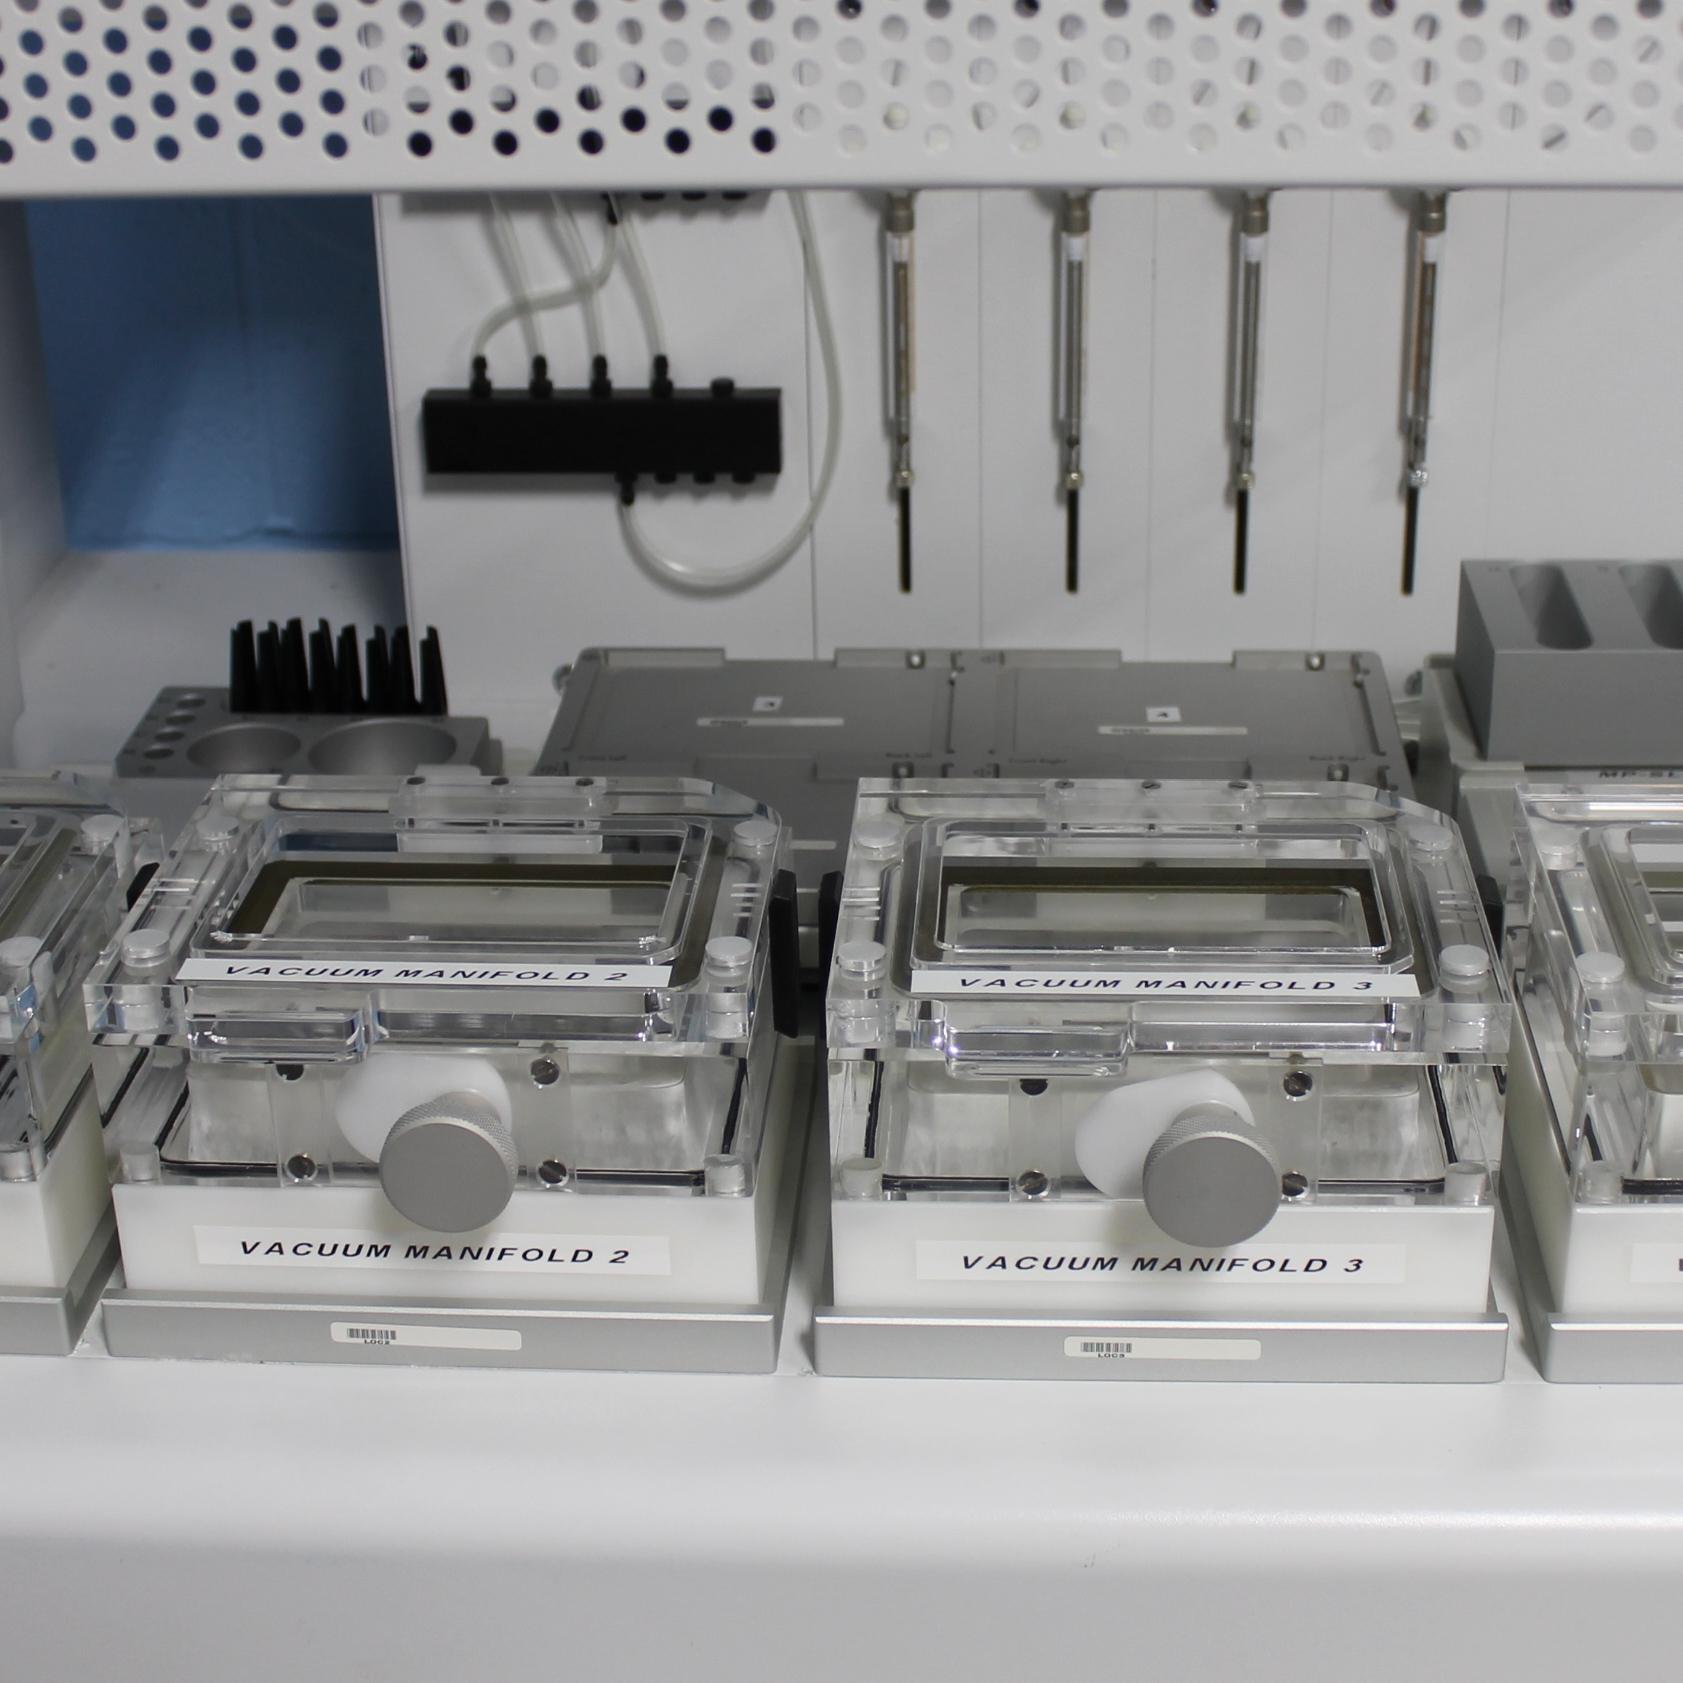 Qiagen BioRobot 3000 Image